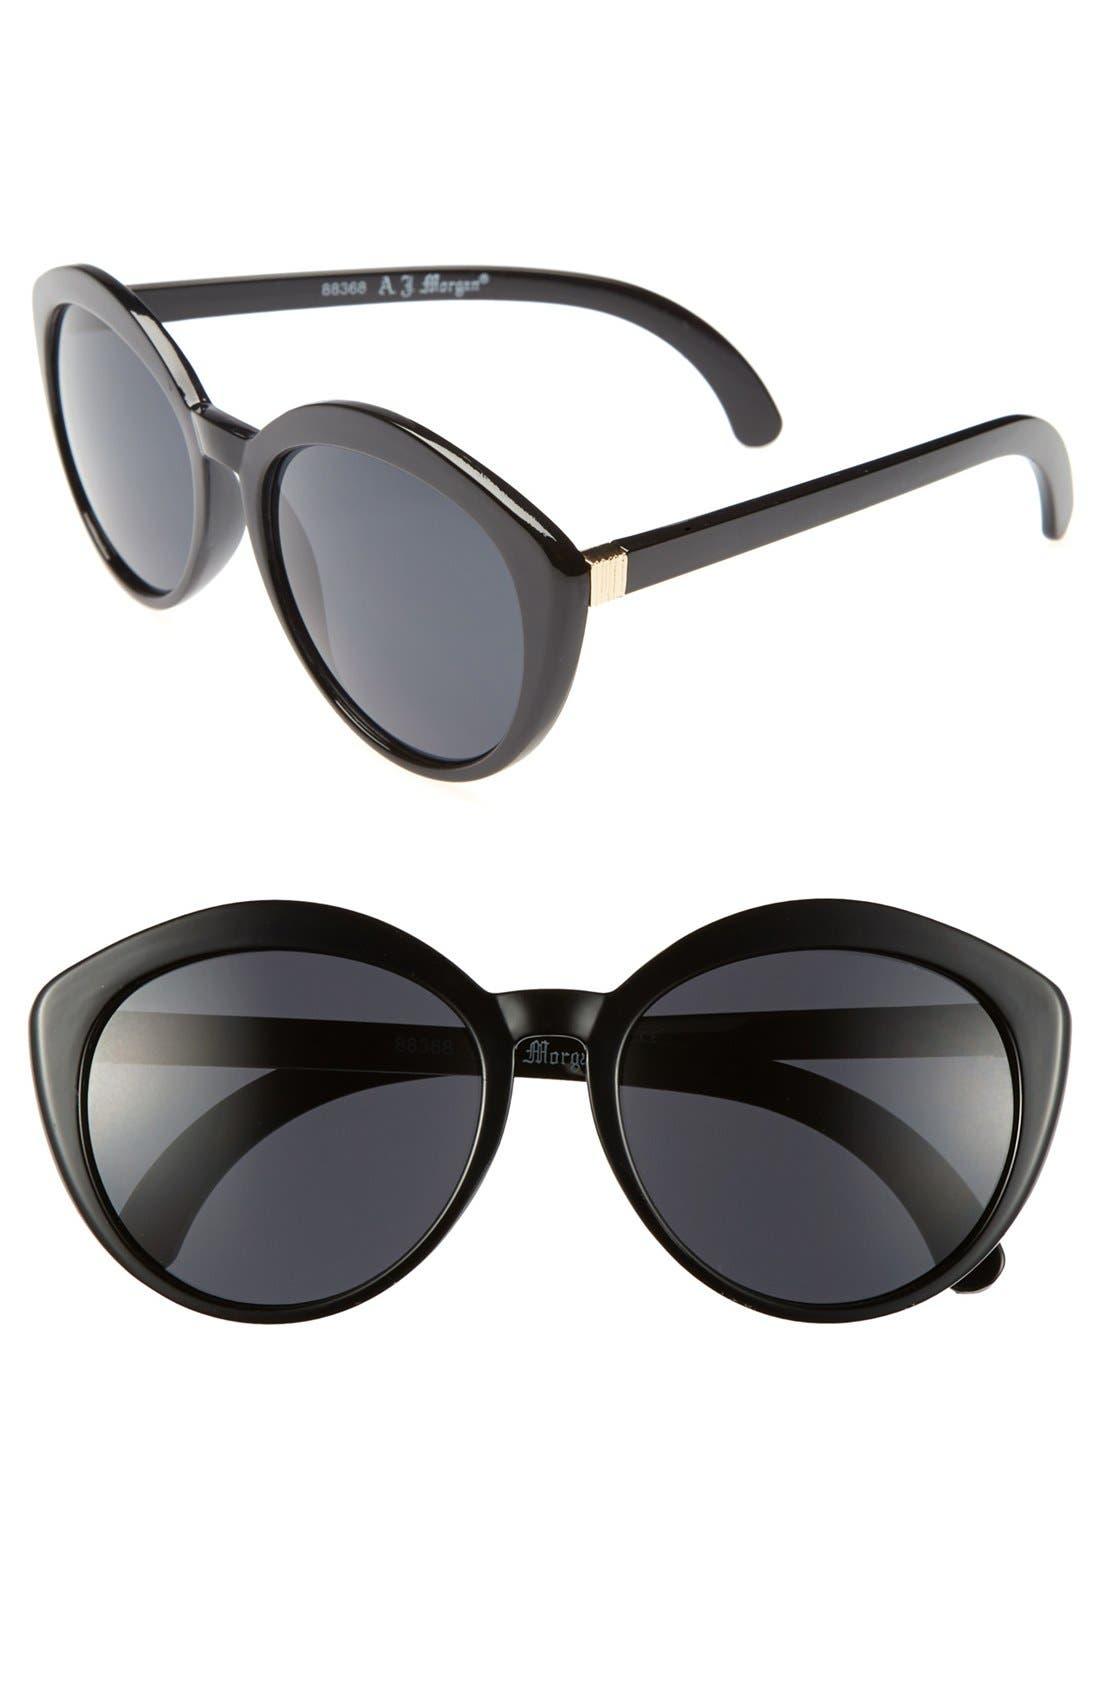 Main Image - A.J. Morgan 'Greta' 57mm Retro Sunglasses